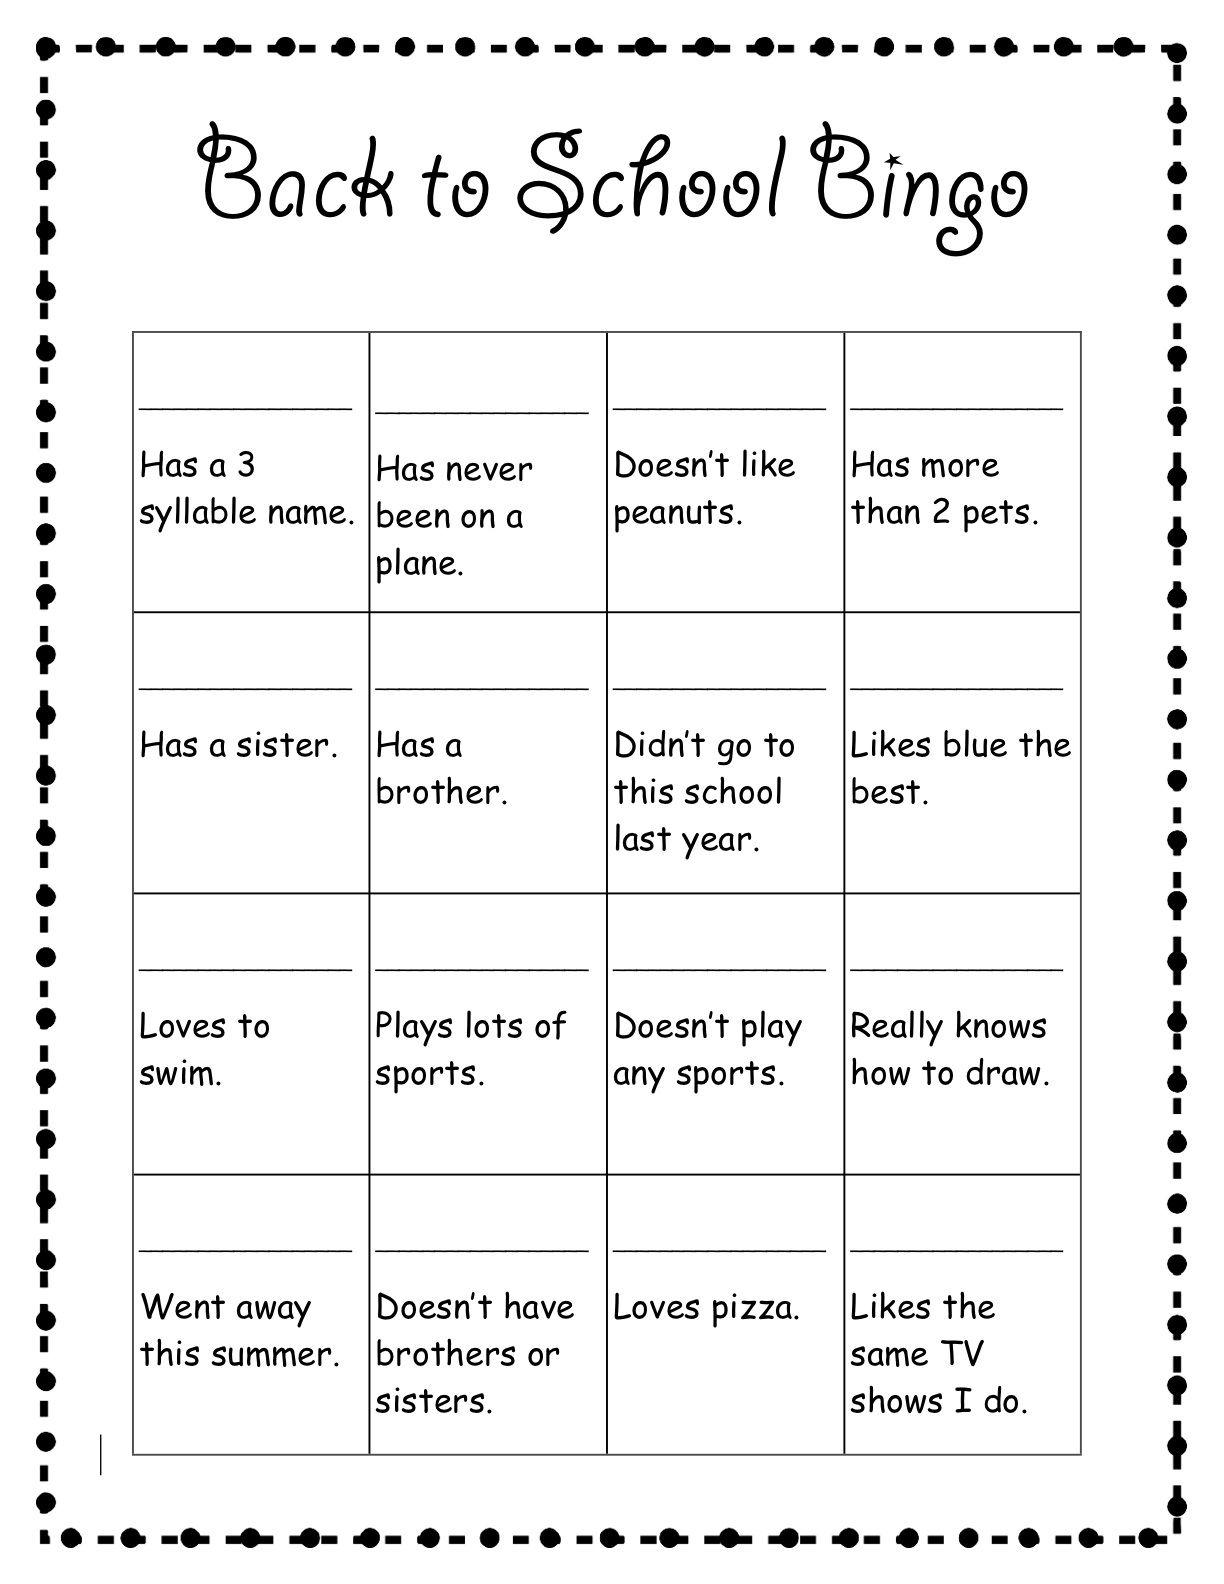 Back To School Bingo School Worksheets 1st Day Of School First Day Of School Activities [ 1584 x 1224 Pixel ]